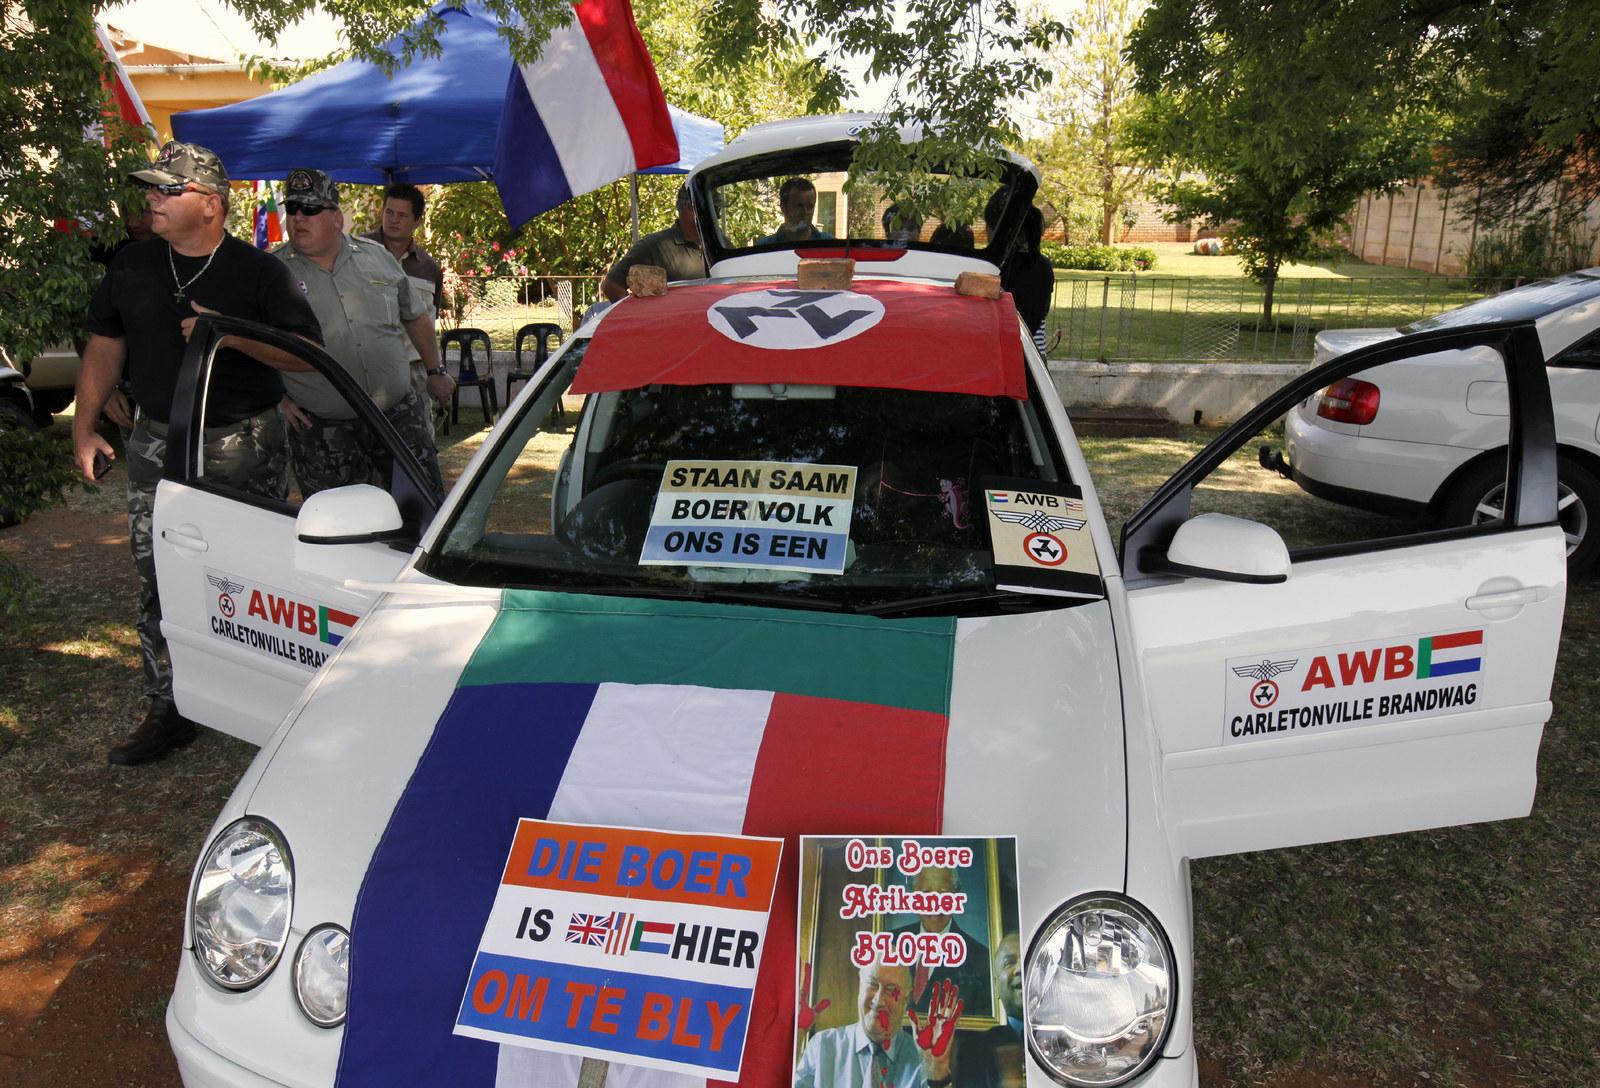 South Africa's Neo-Nazi Movement Sent Donald Trump Congratulations After His Win